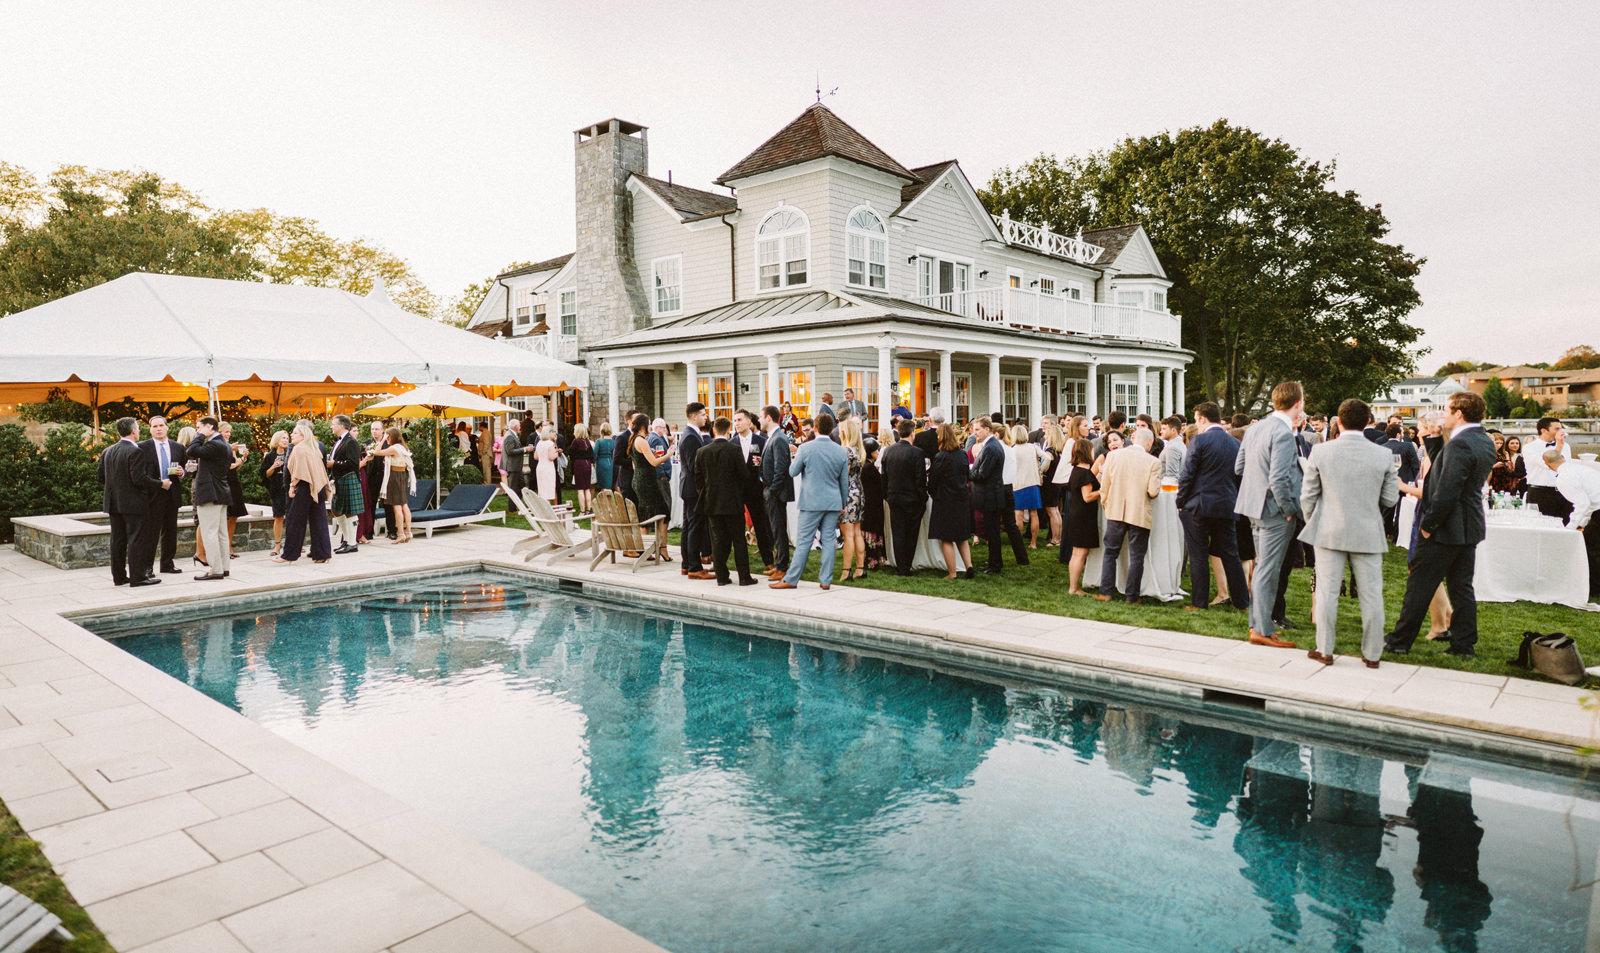 bridgeport-wedding-127 BRIDGEPORT, CONNECTICUT BACKYARD WEDDING